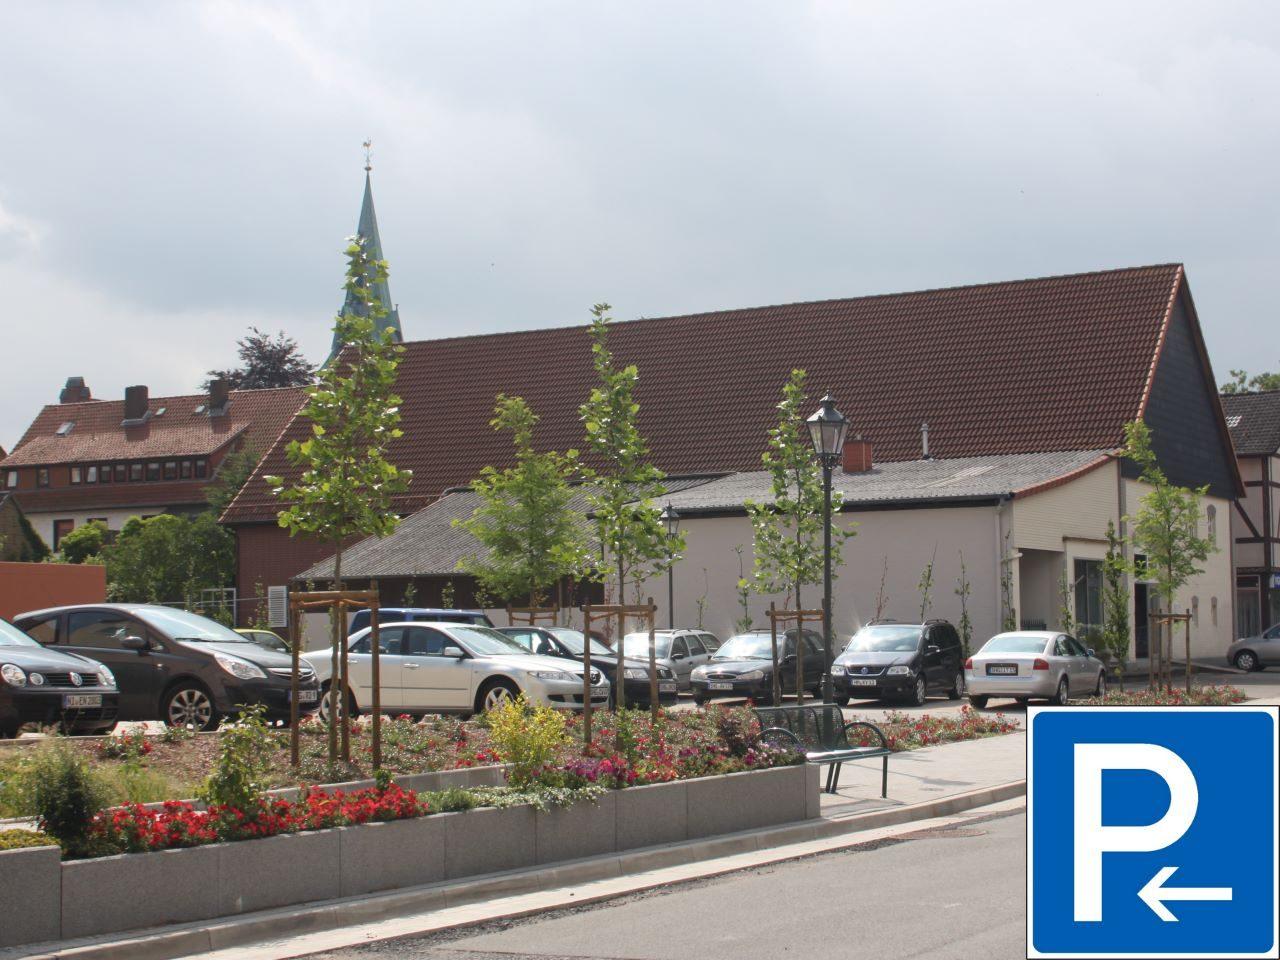 Parkplaetze_Markt-Apotheke_Lauenau